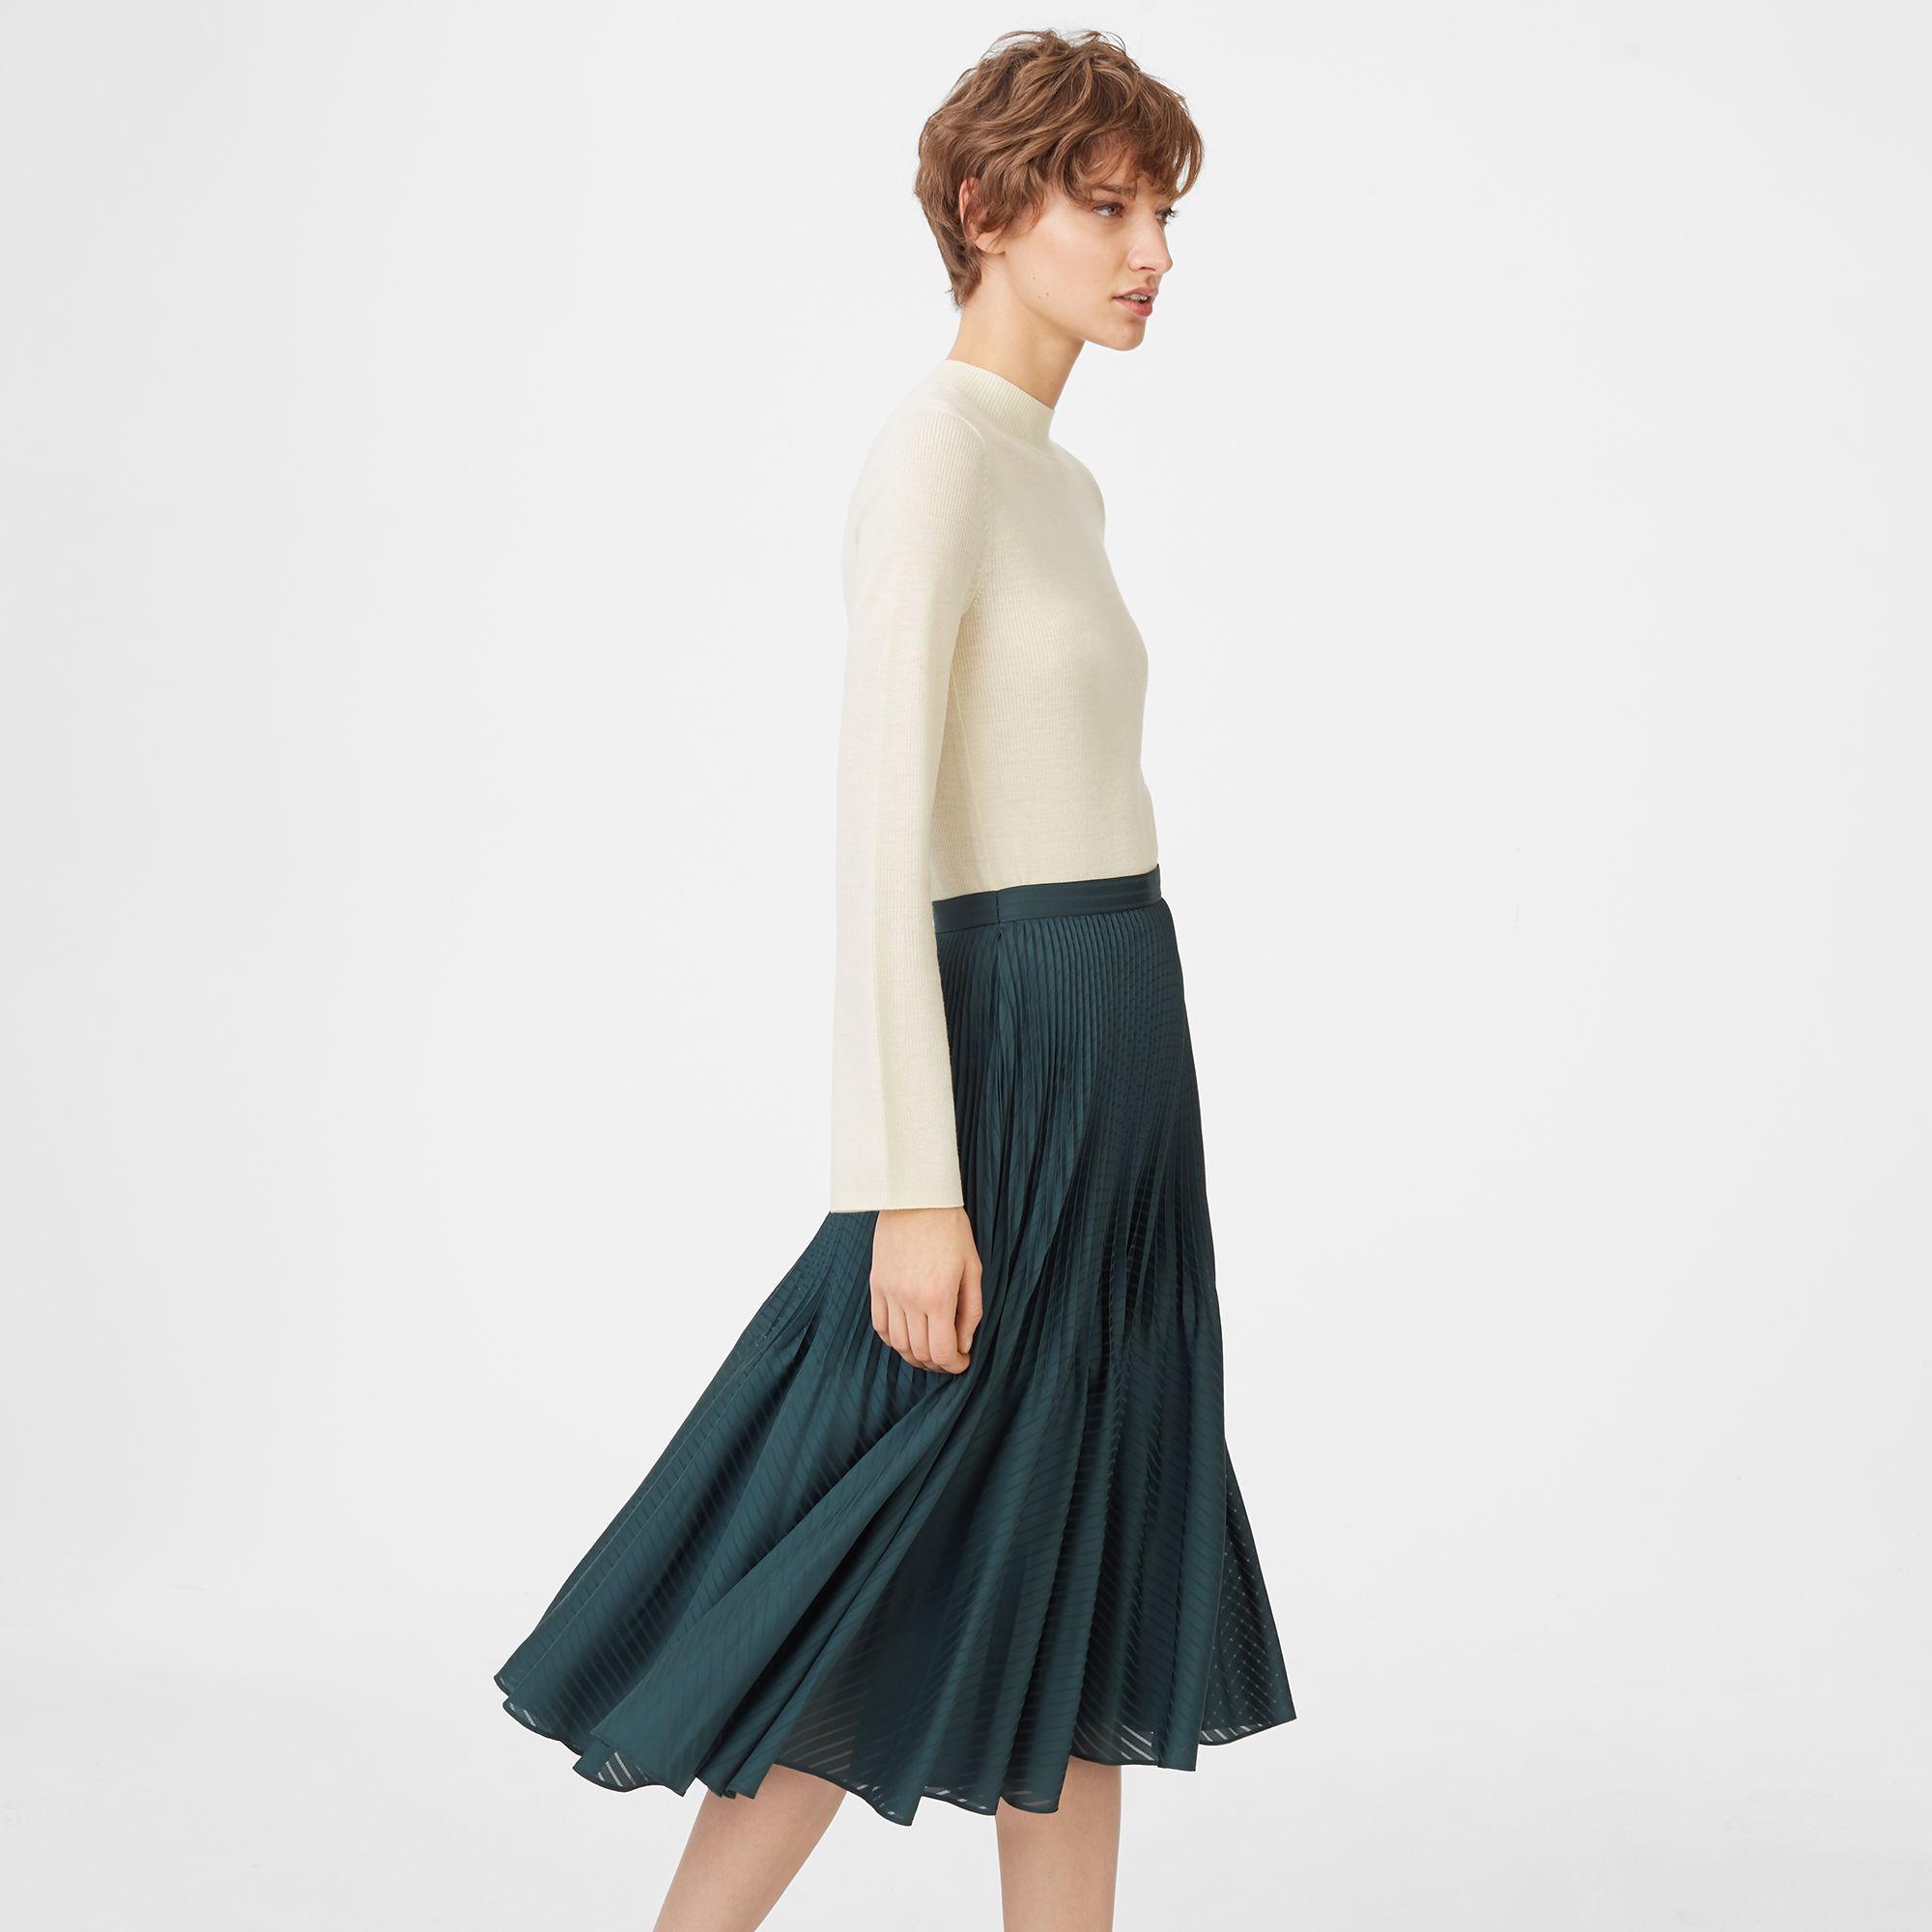 5c7064f0c284 Club Monaco Yowshee Skirt in Green - Lyst